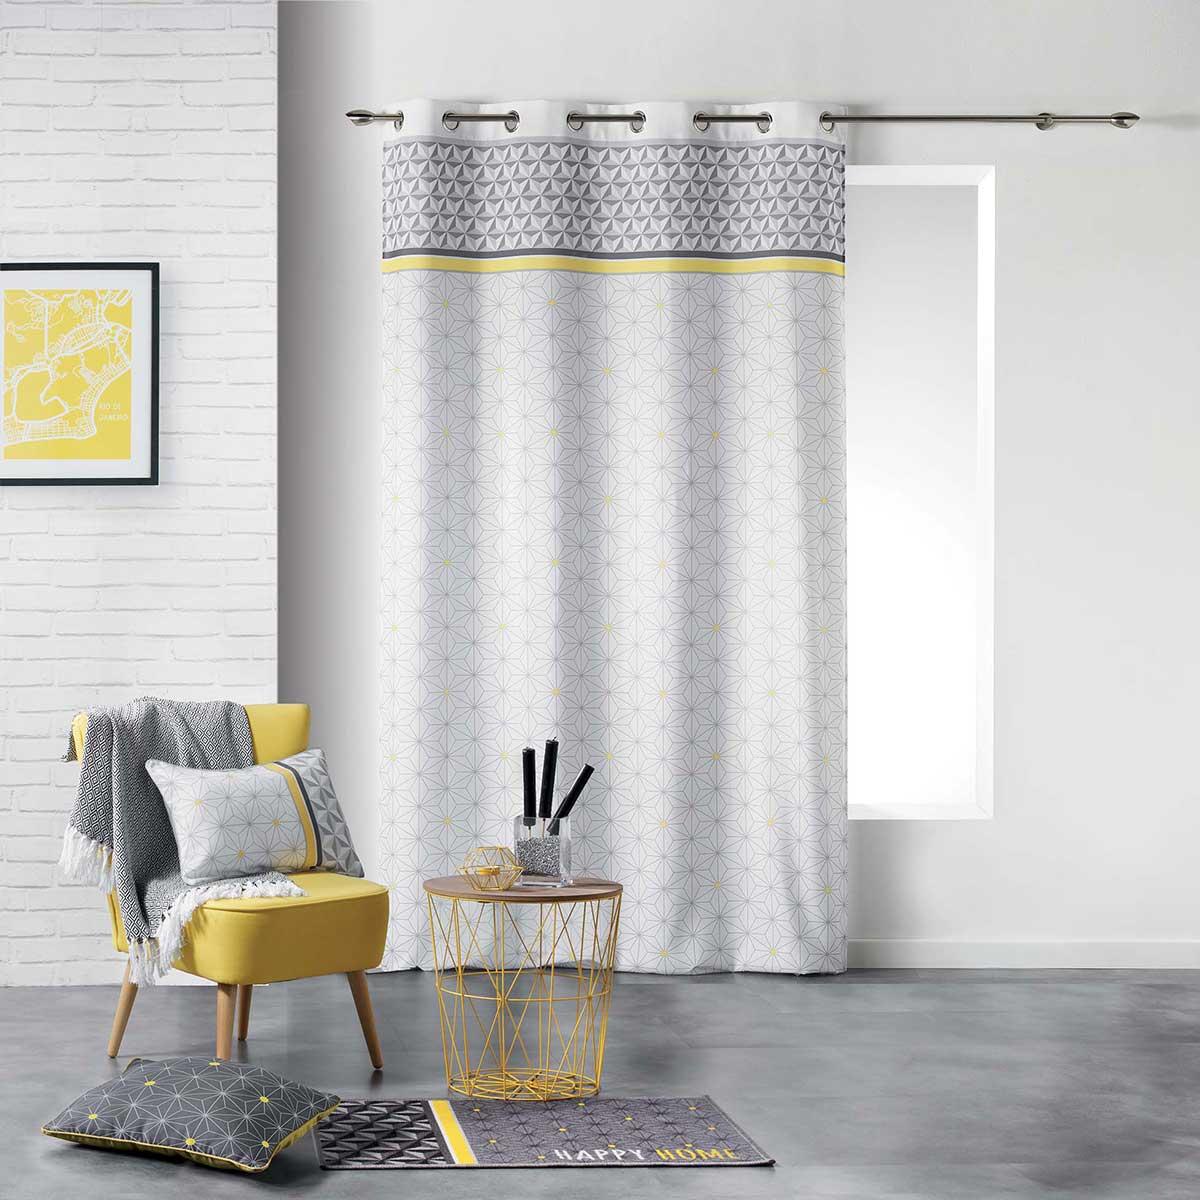 rideau tamisant inspiration scandinave jaune menthe. Black Bedroom Furniture Sets. Home Design Ideas